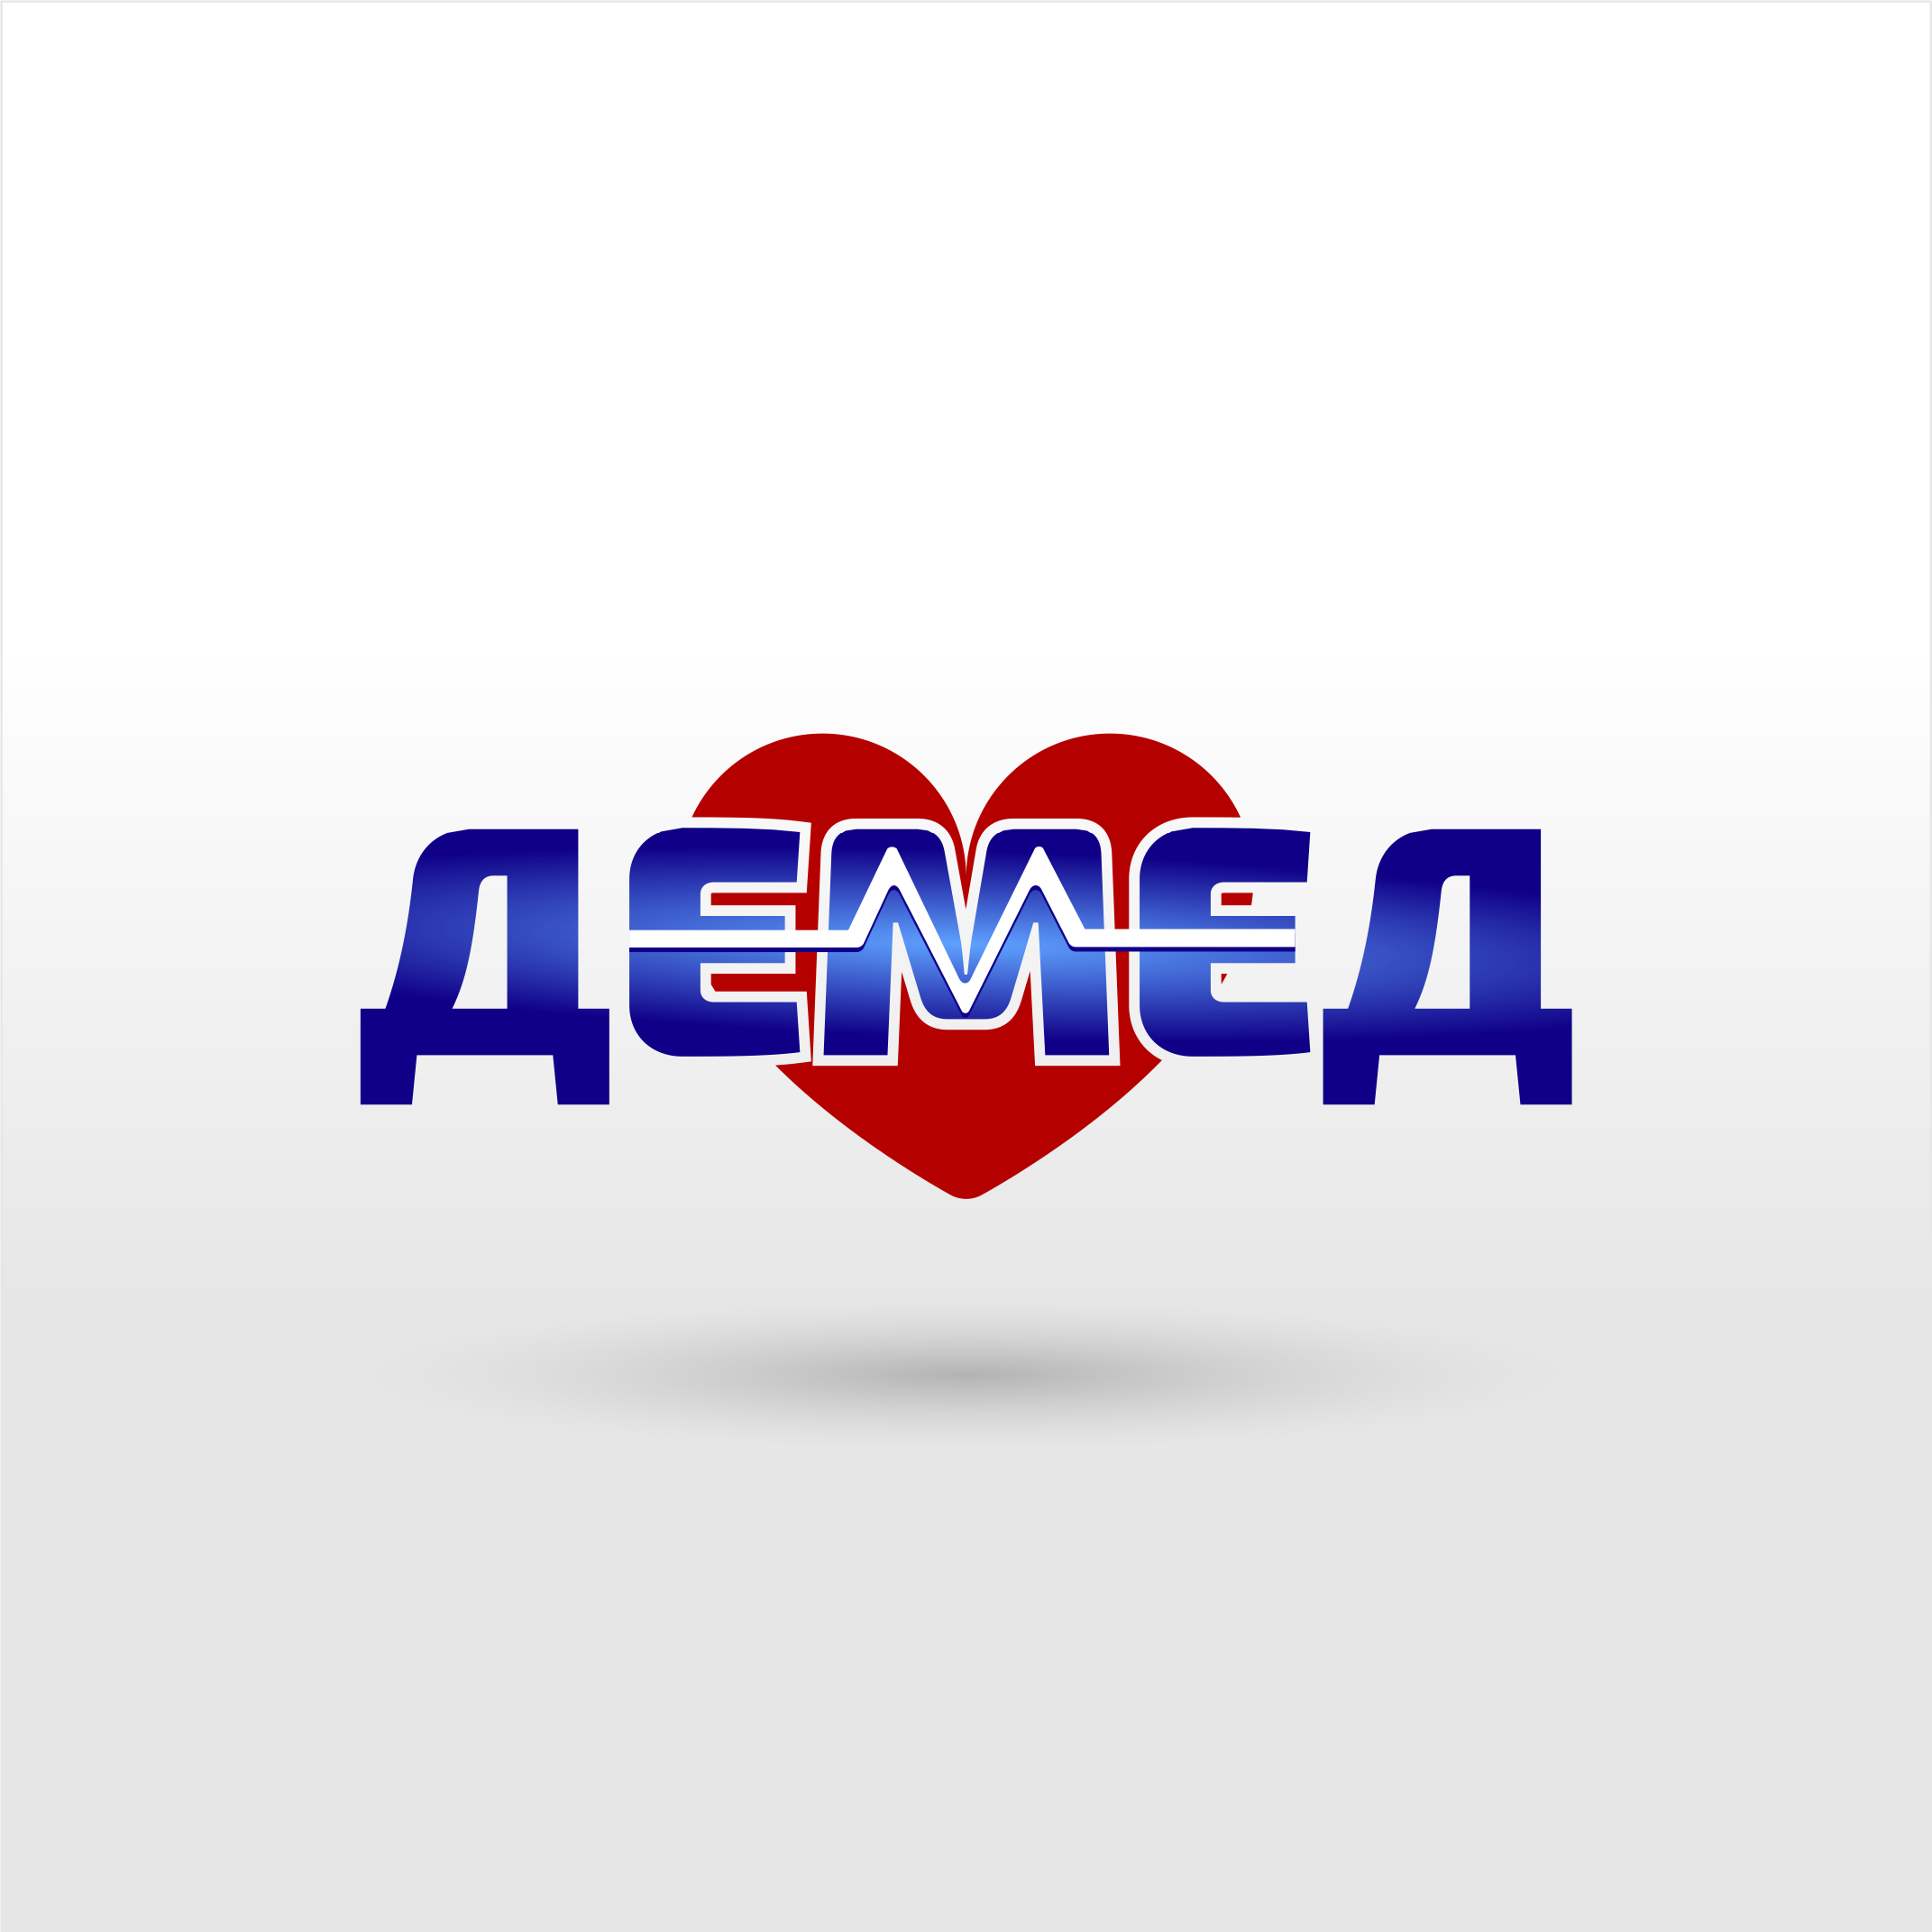 Логотип медицинского центра фото f_6015dcb98681bd29.png